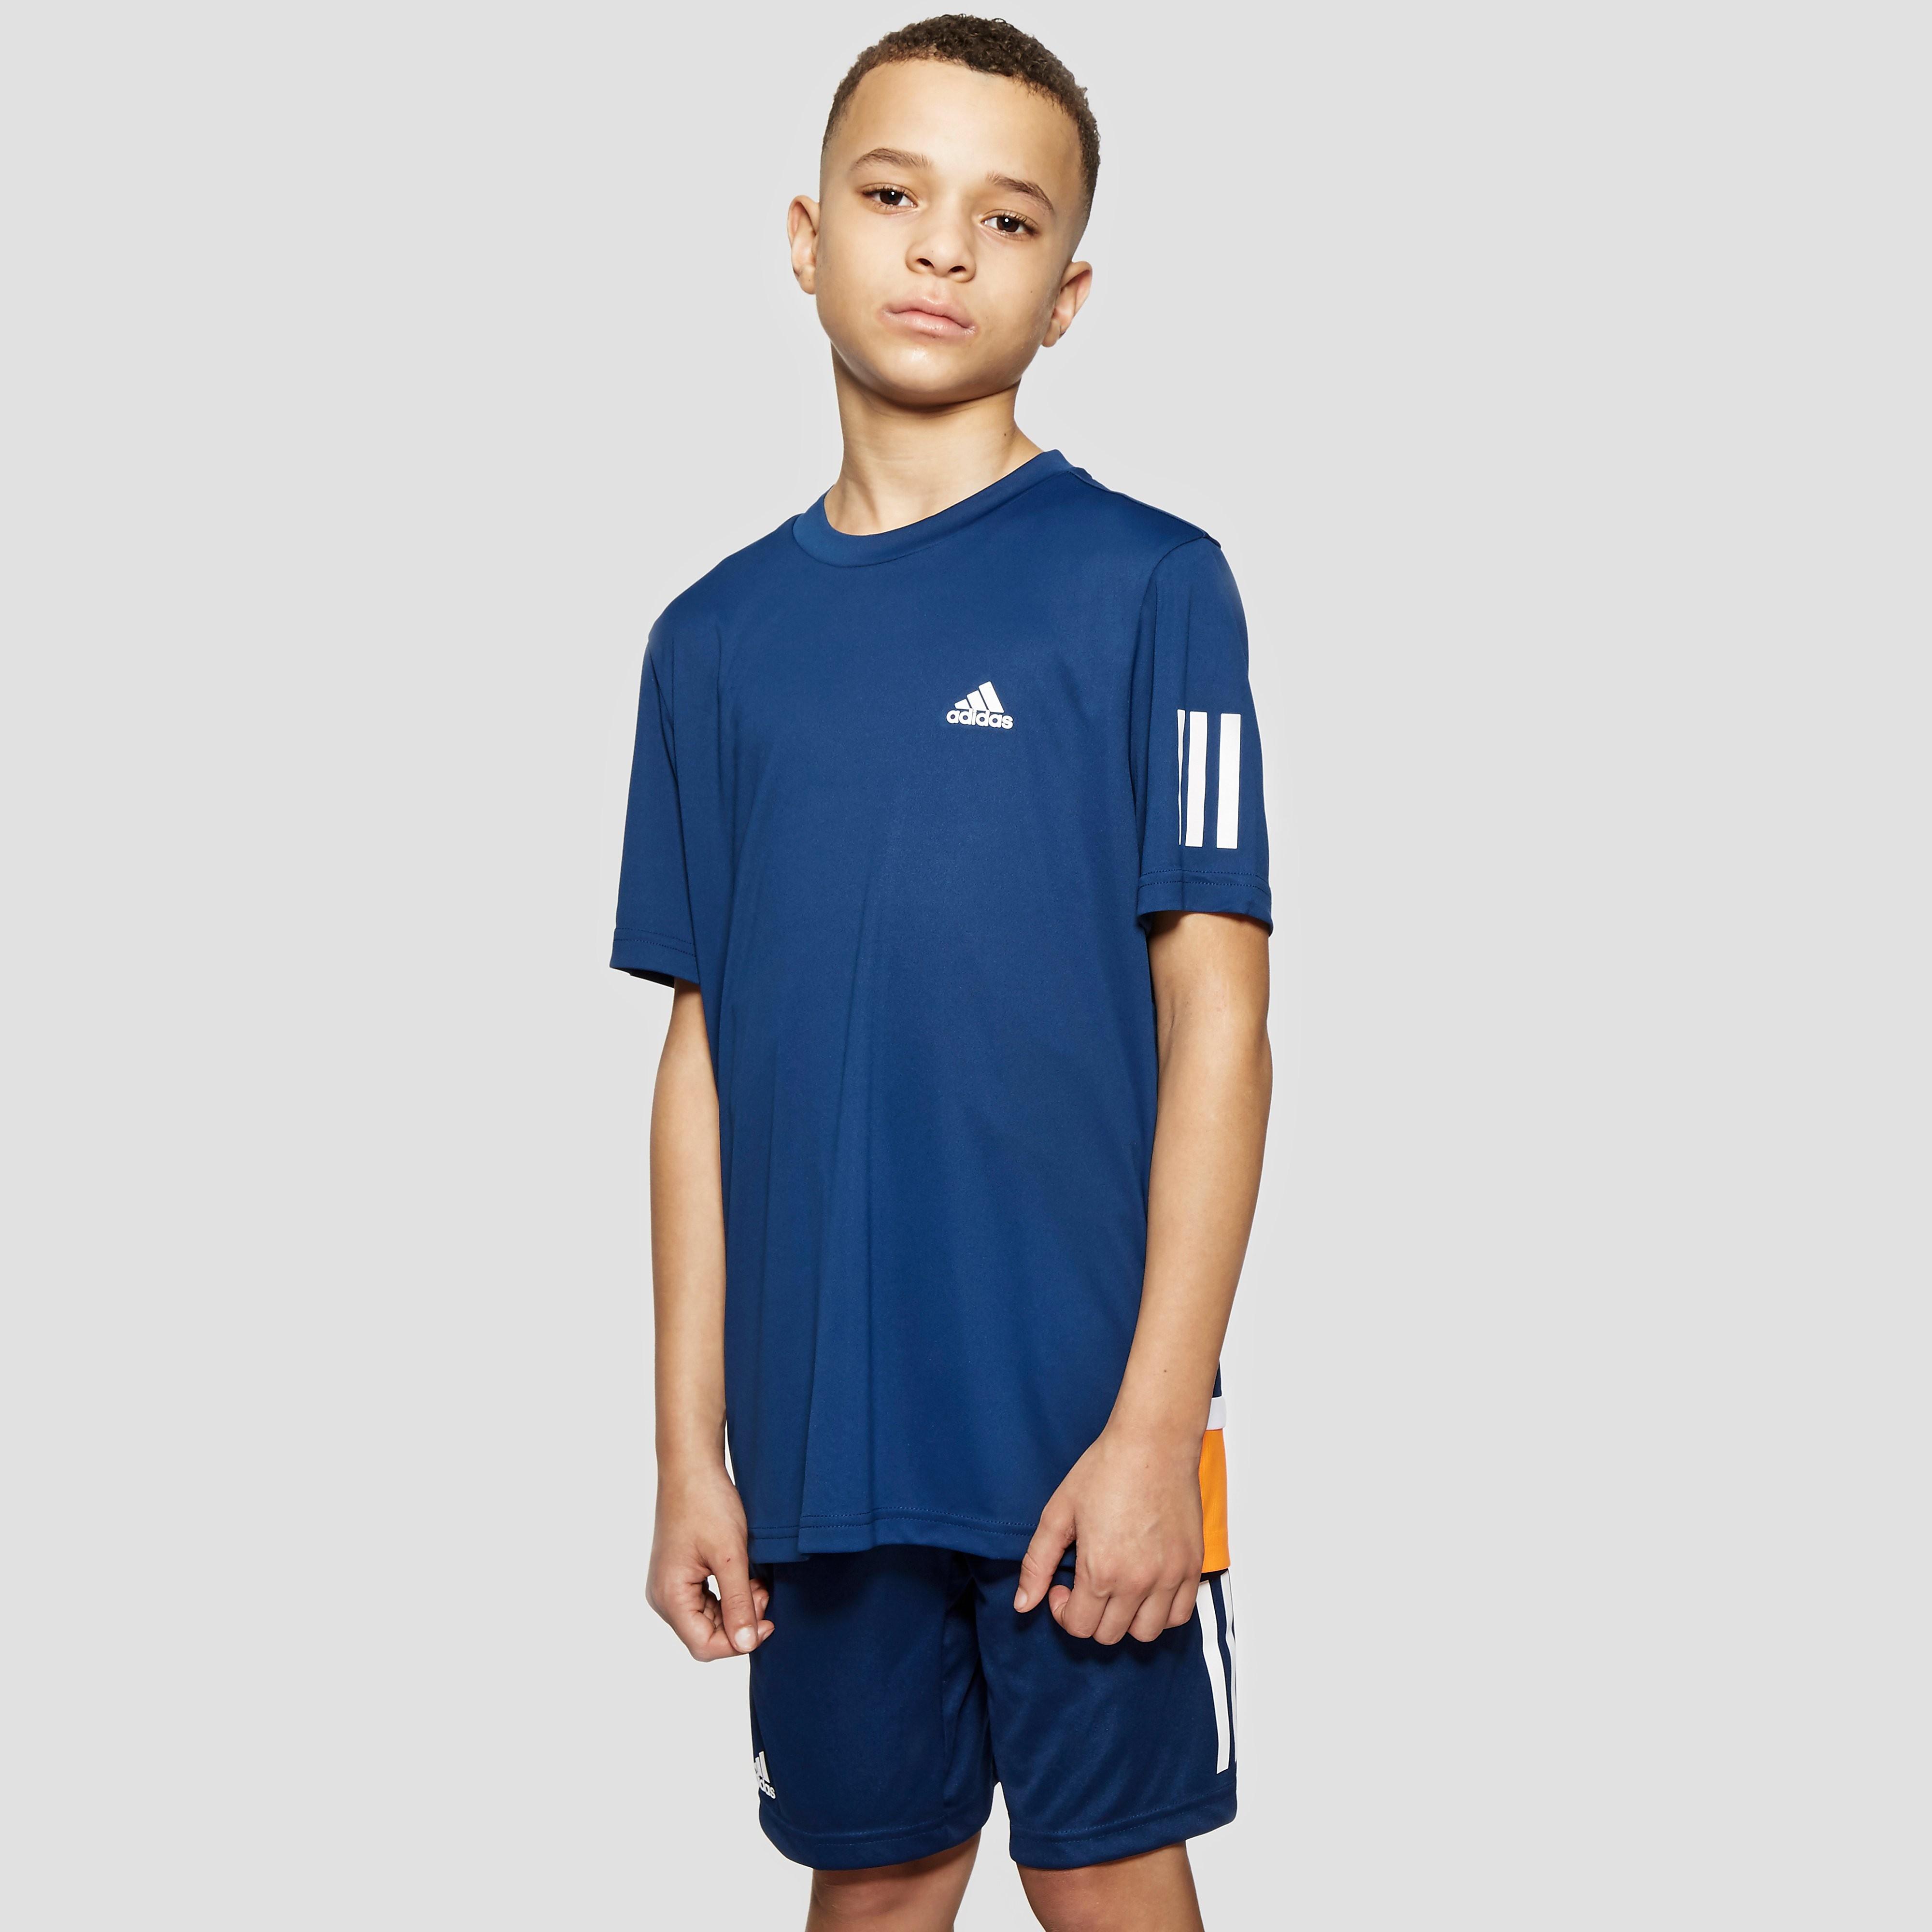 adidas Club Boy's Tennis T-Shirt